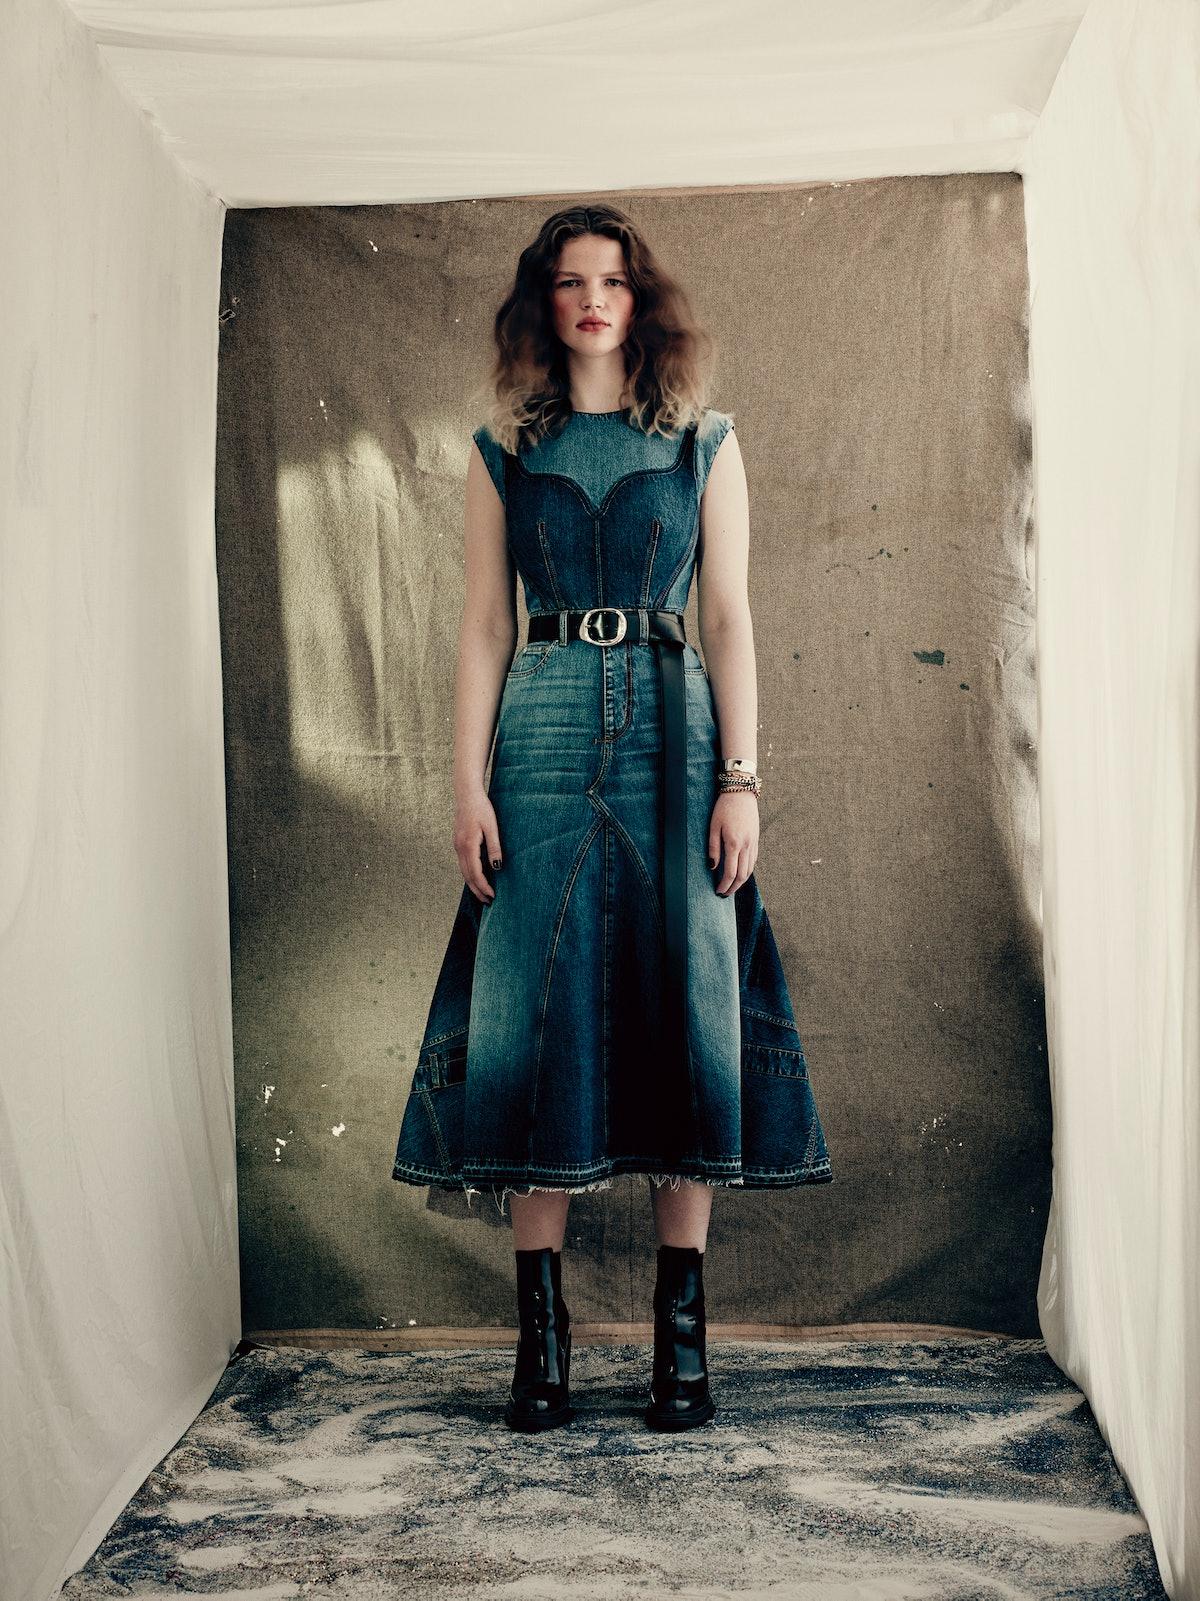 model in denim dress by Alexander McQueen